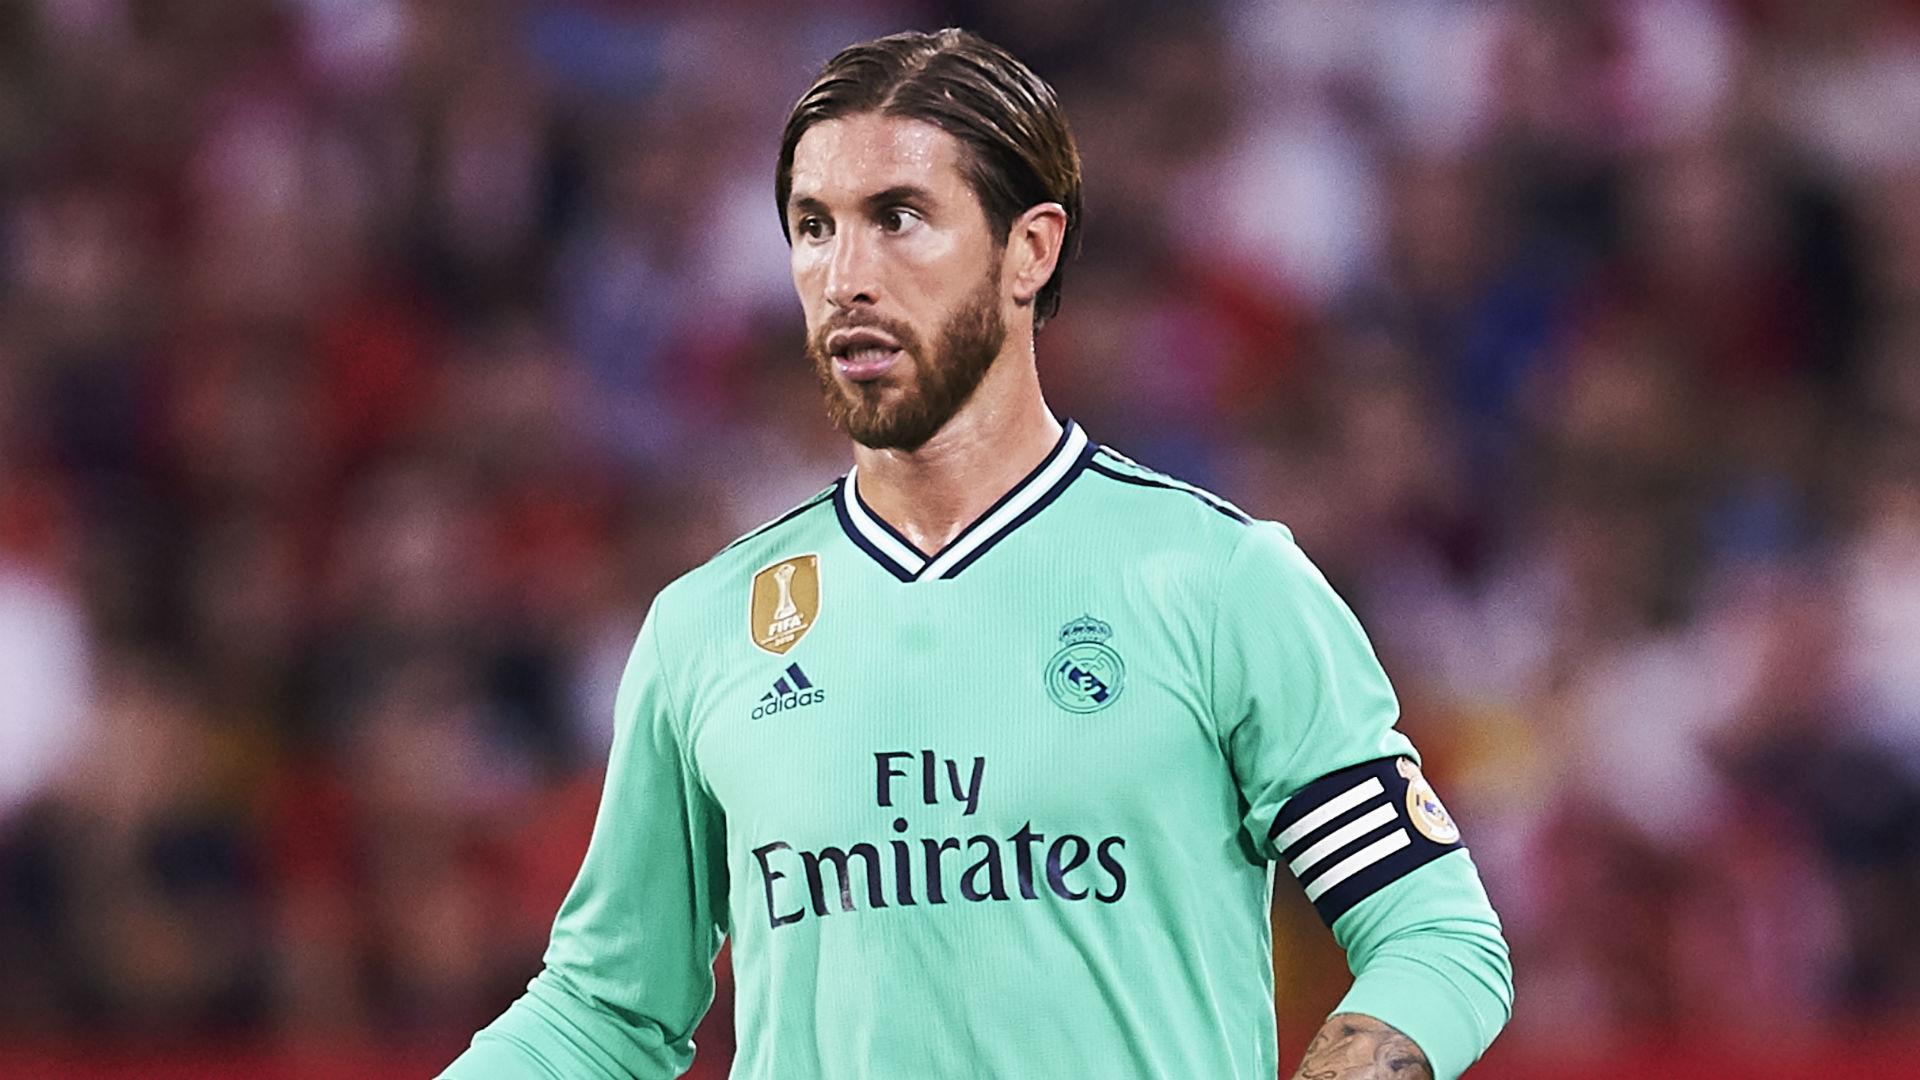 Madrid always 'angry' to win - Sergio Ramos